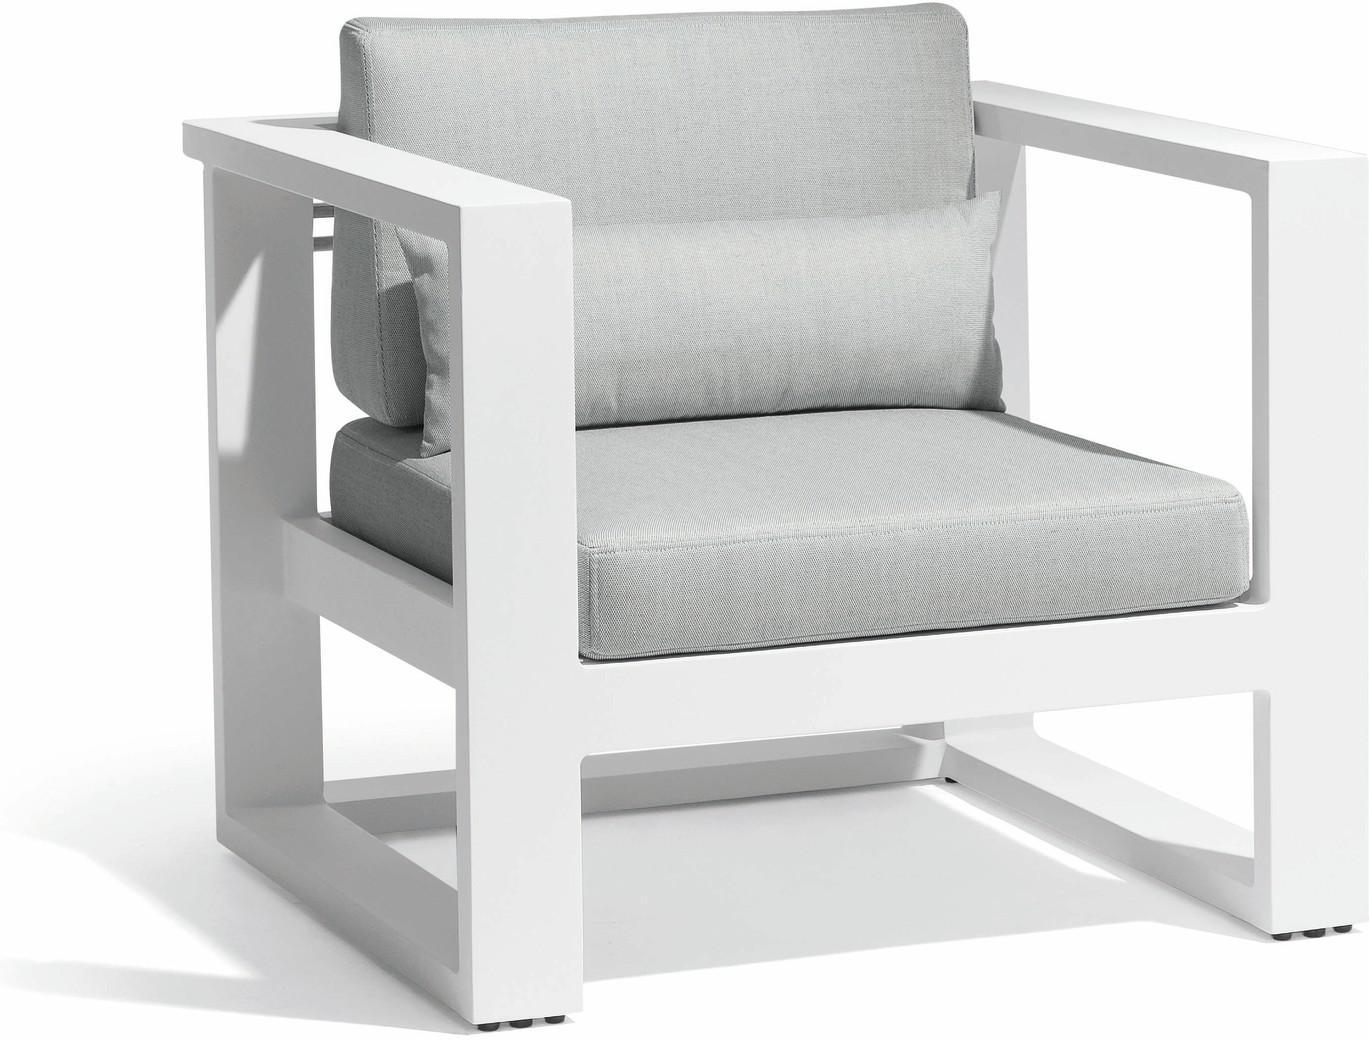 Fuse 1 plaza - blanco - textiles blancos